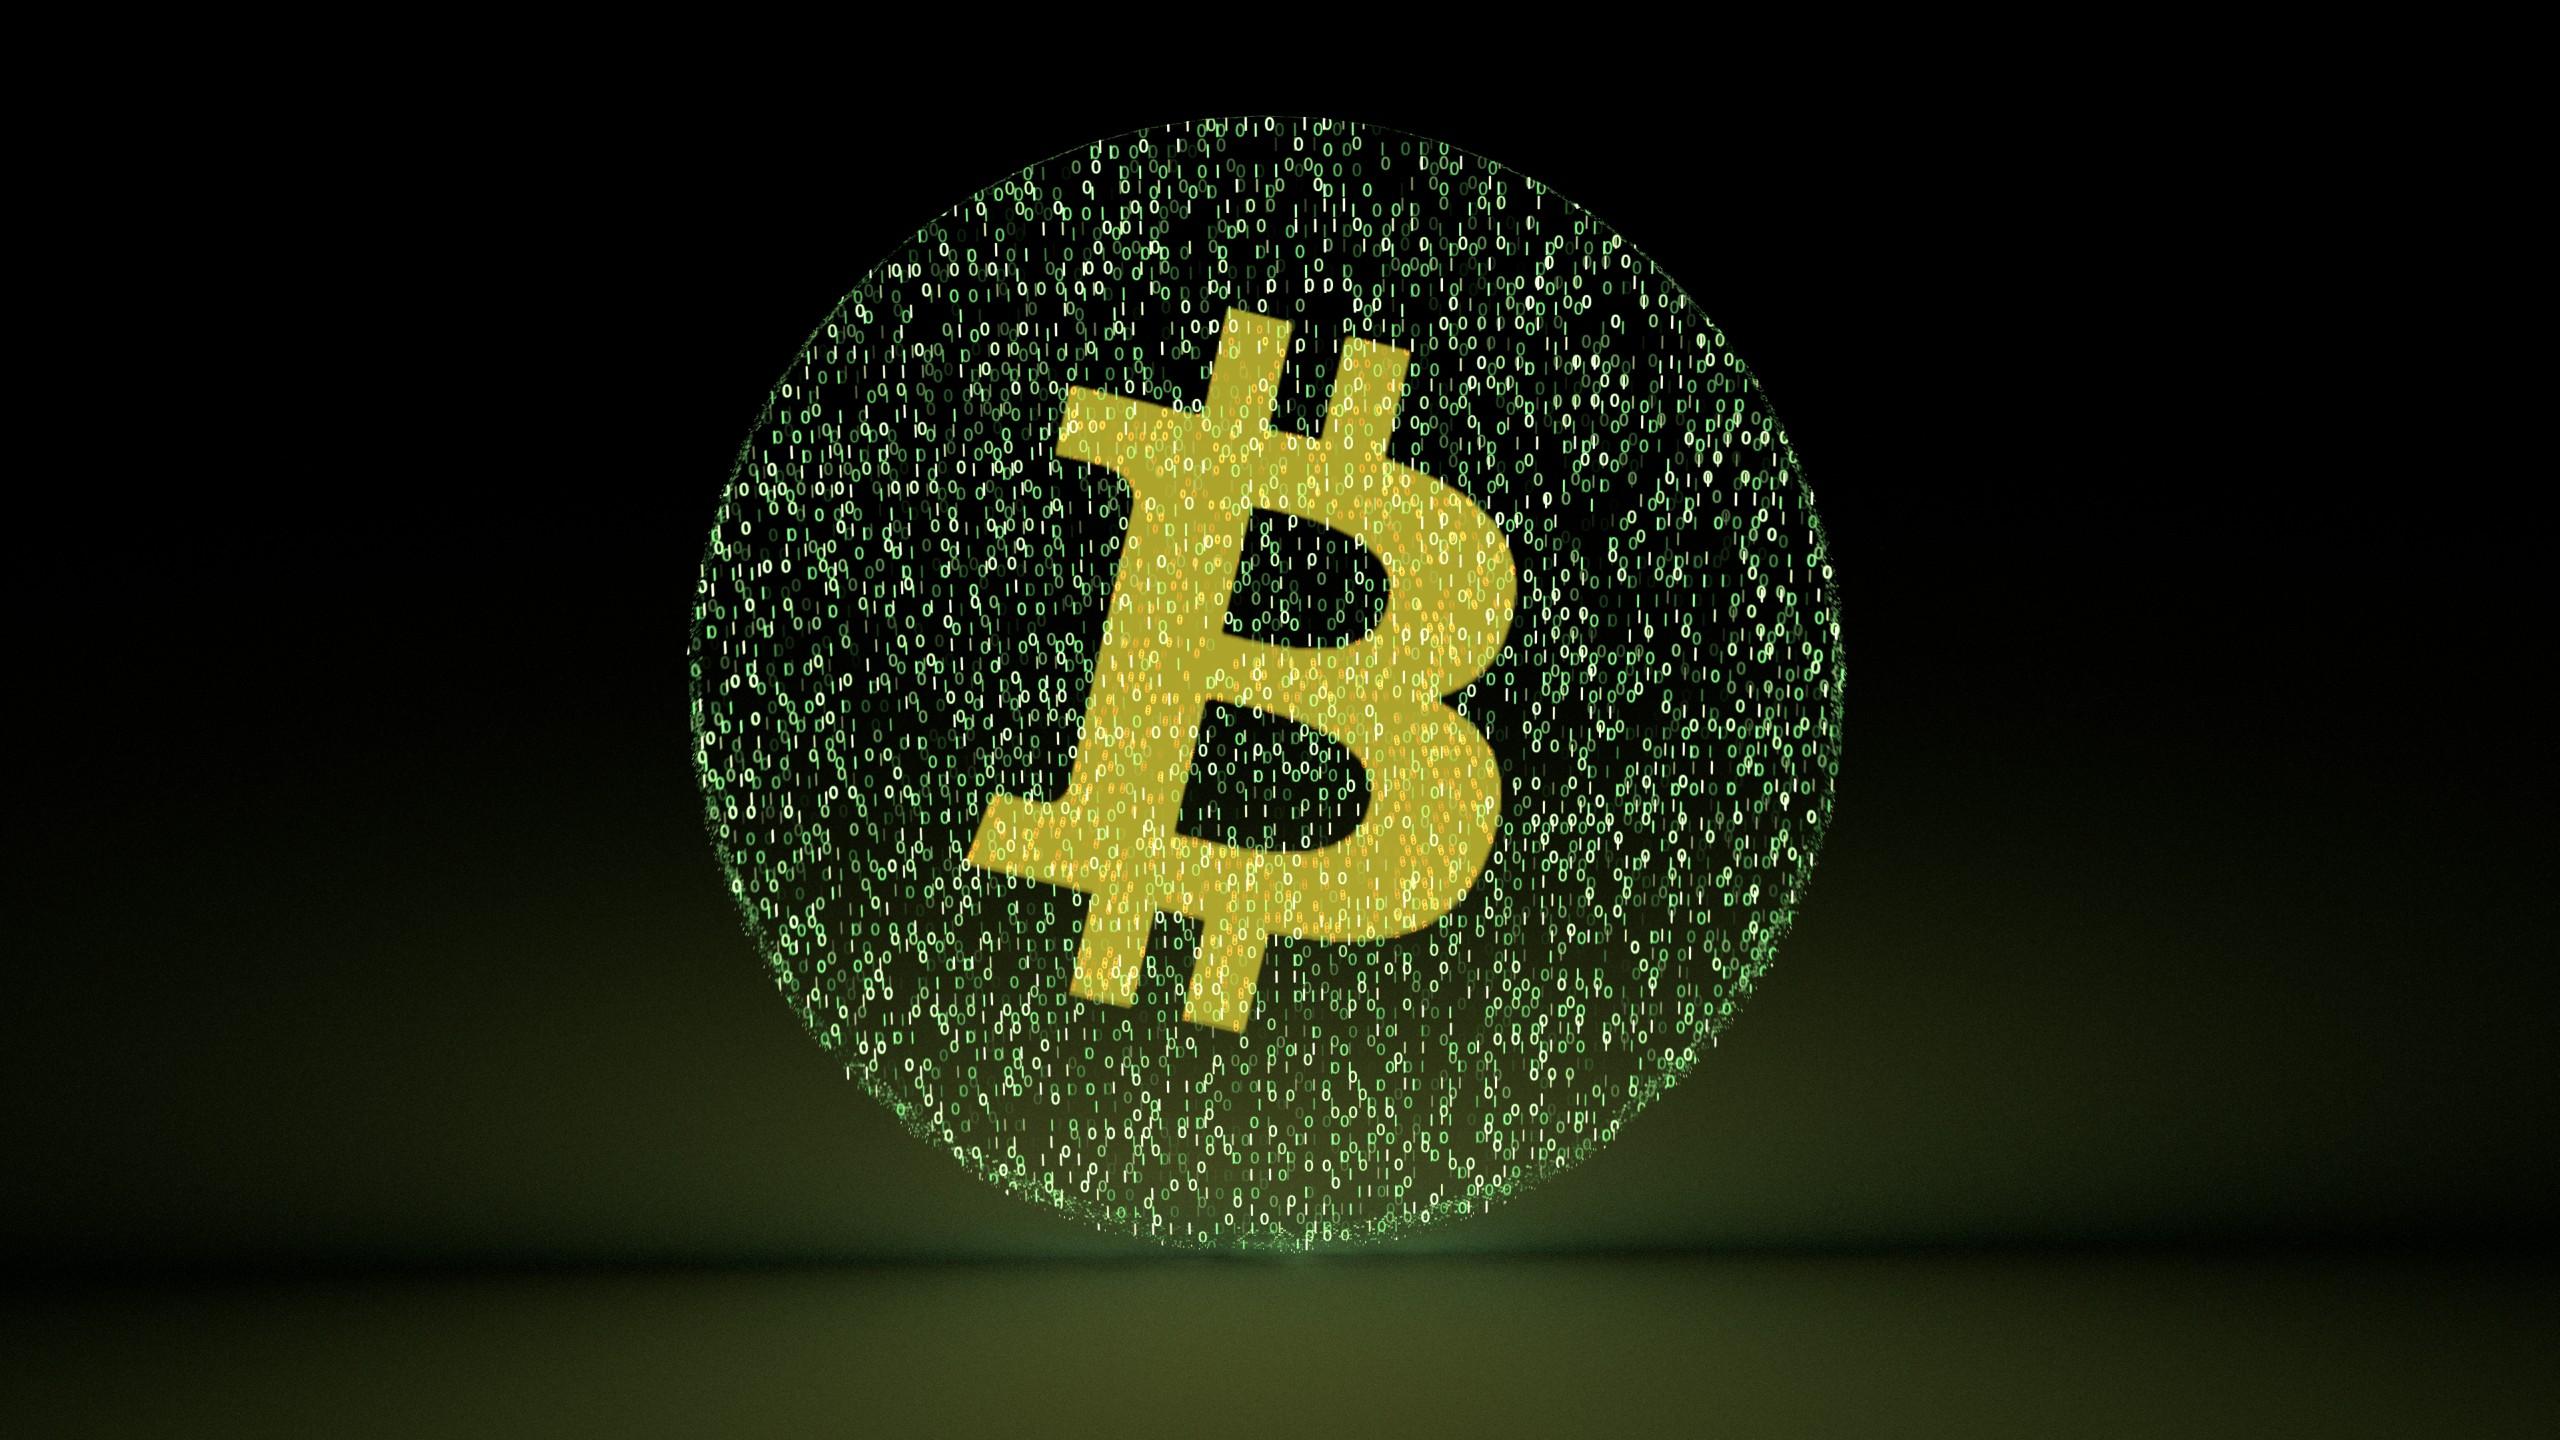 bitcoin wallpaper background 62349